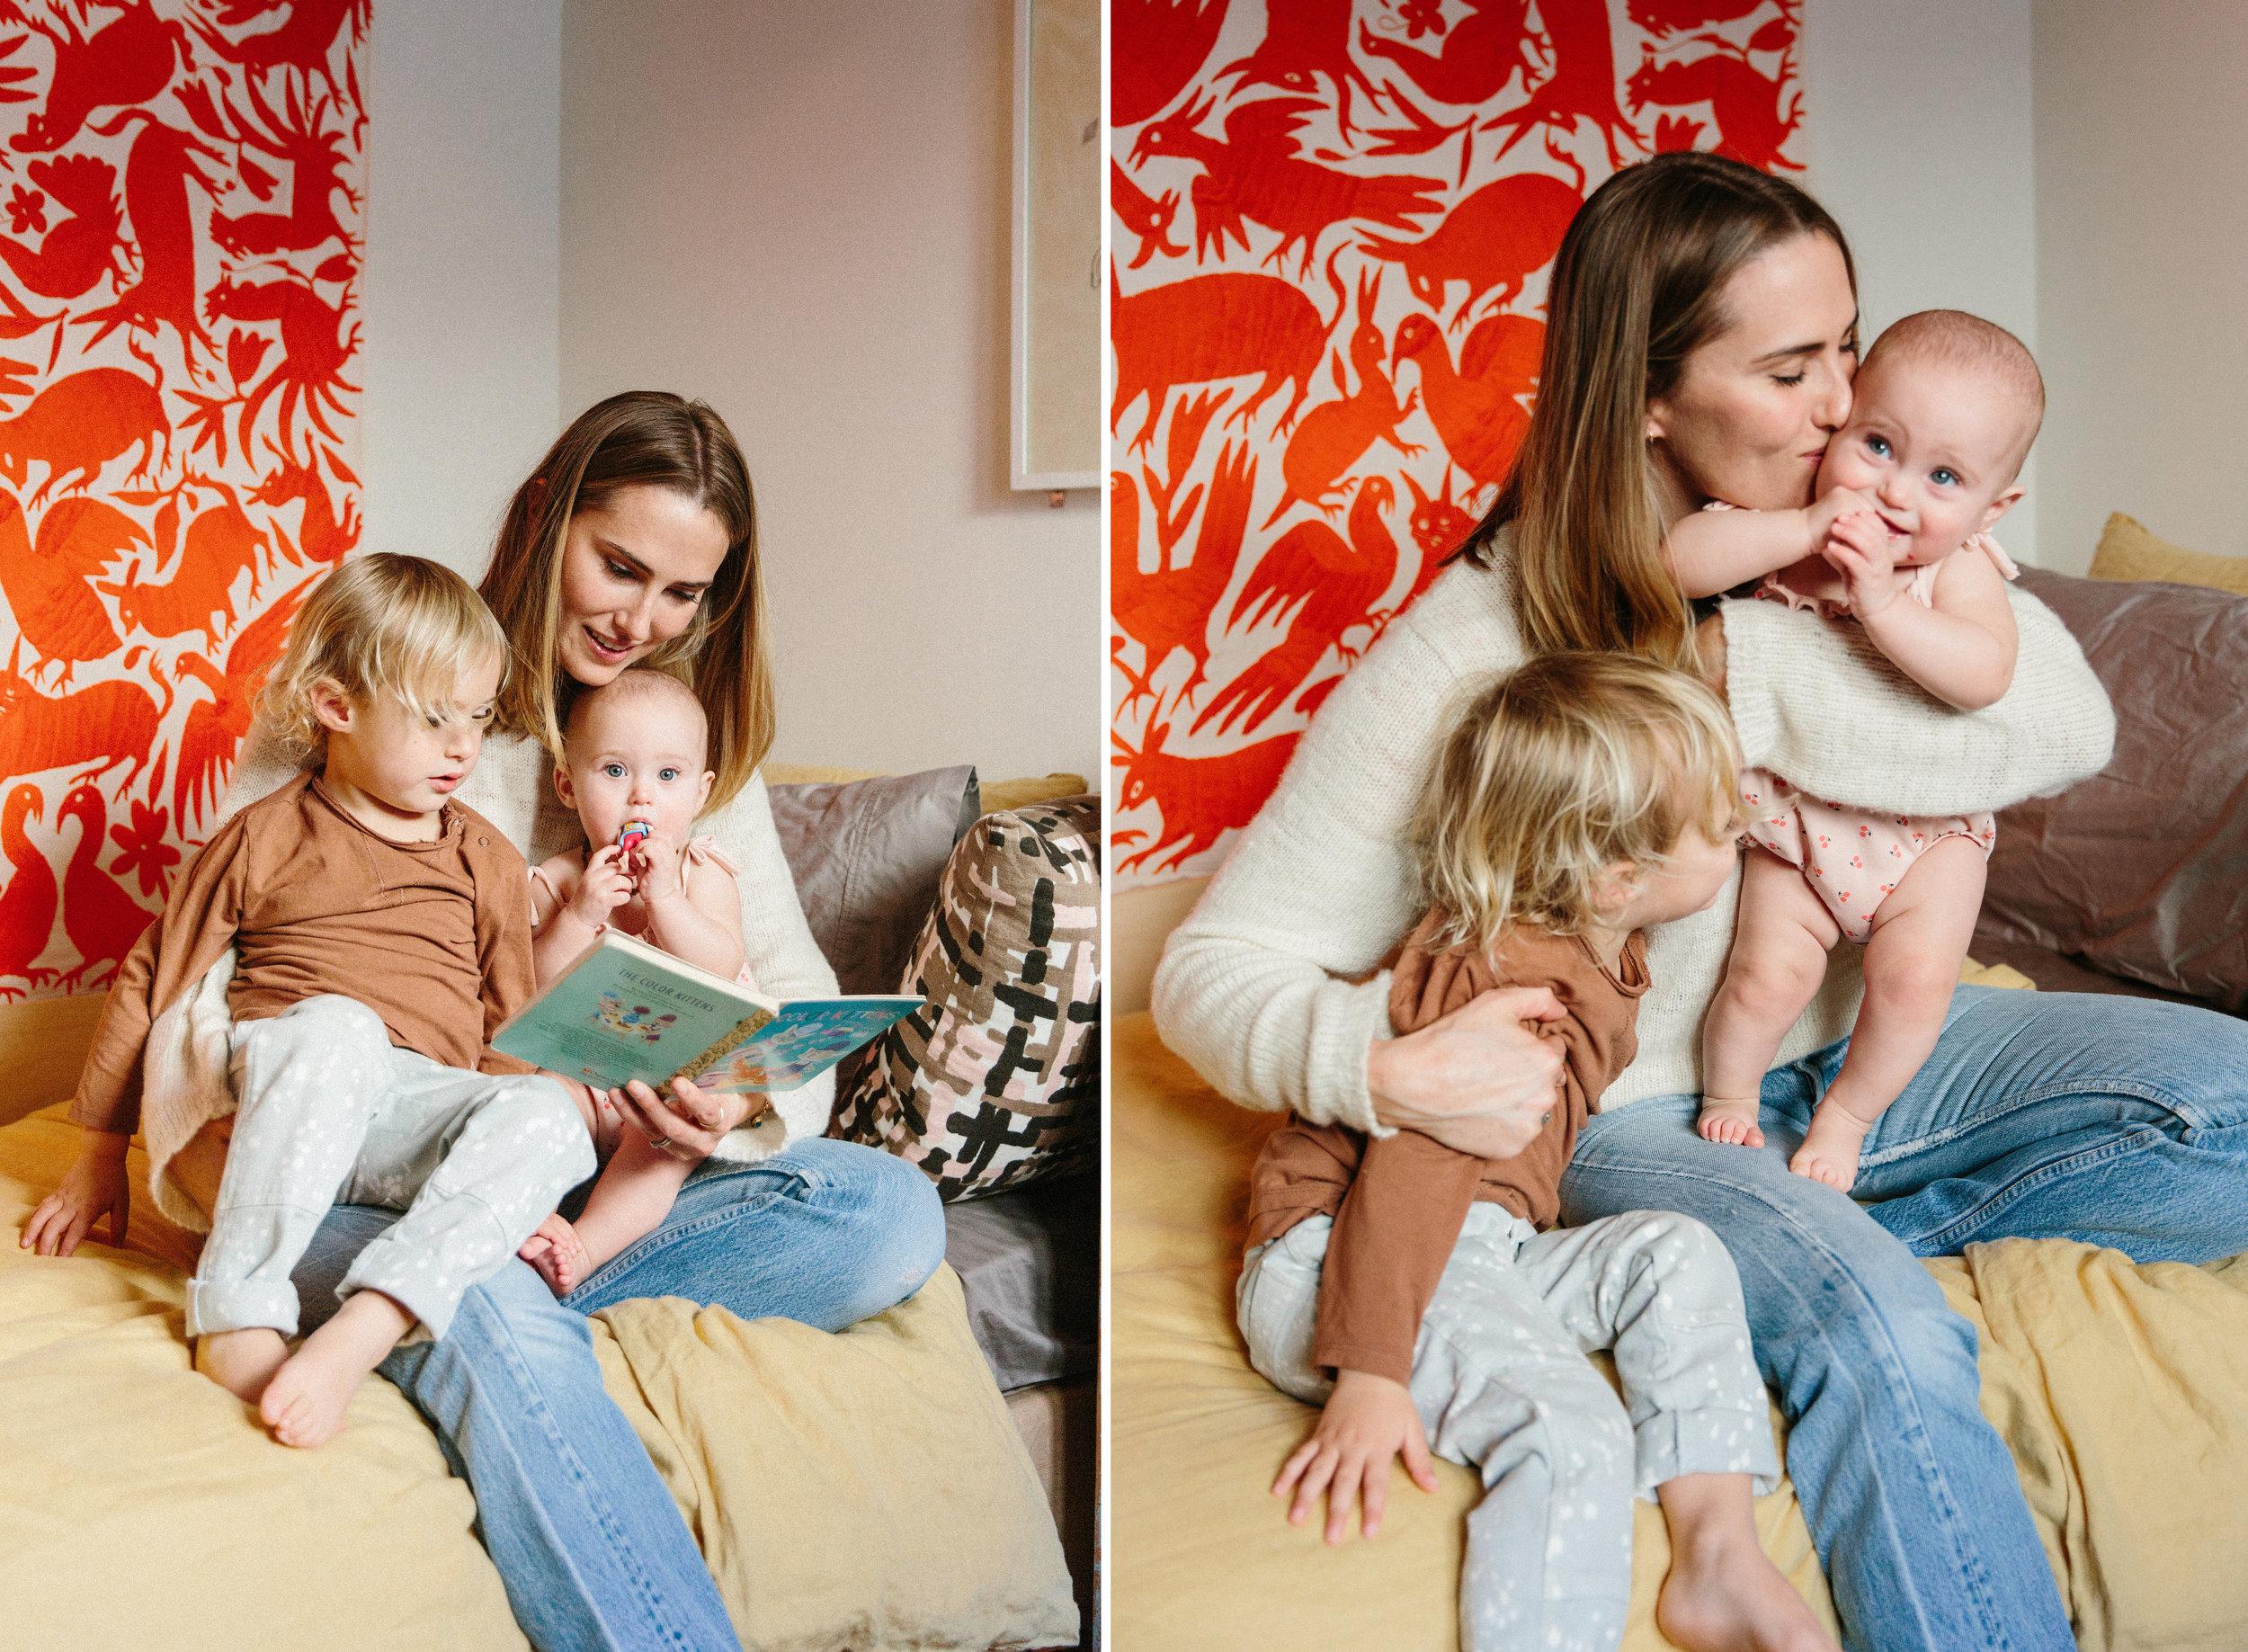 callow-family_venice-los-angeles-baby-child-family-photographer_nicki-sebastian-photography_7.jpg